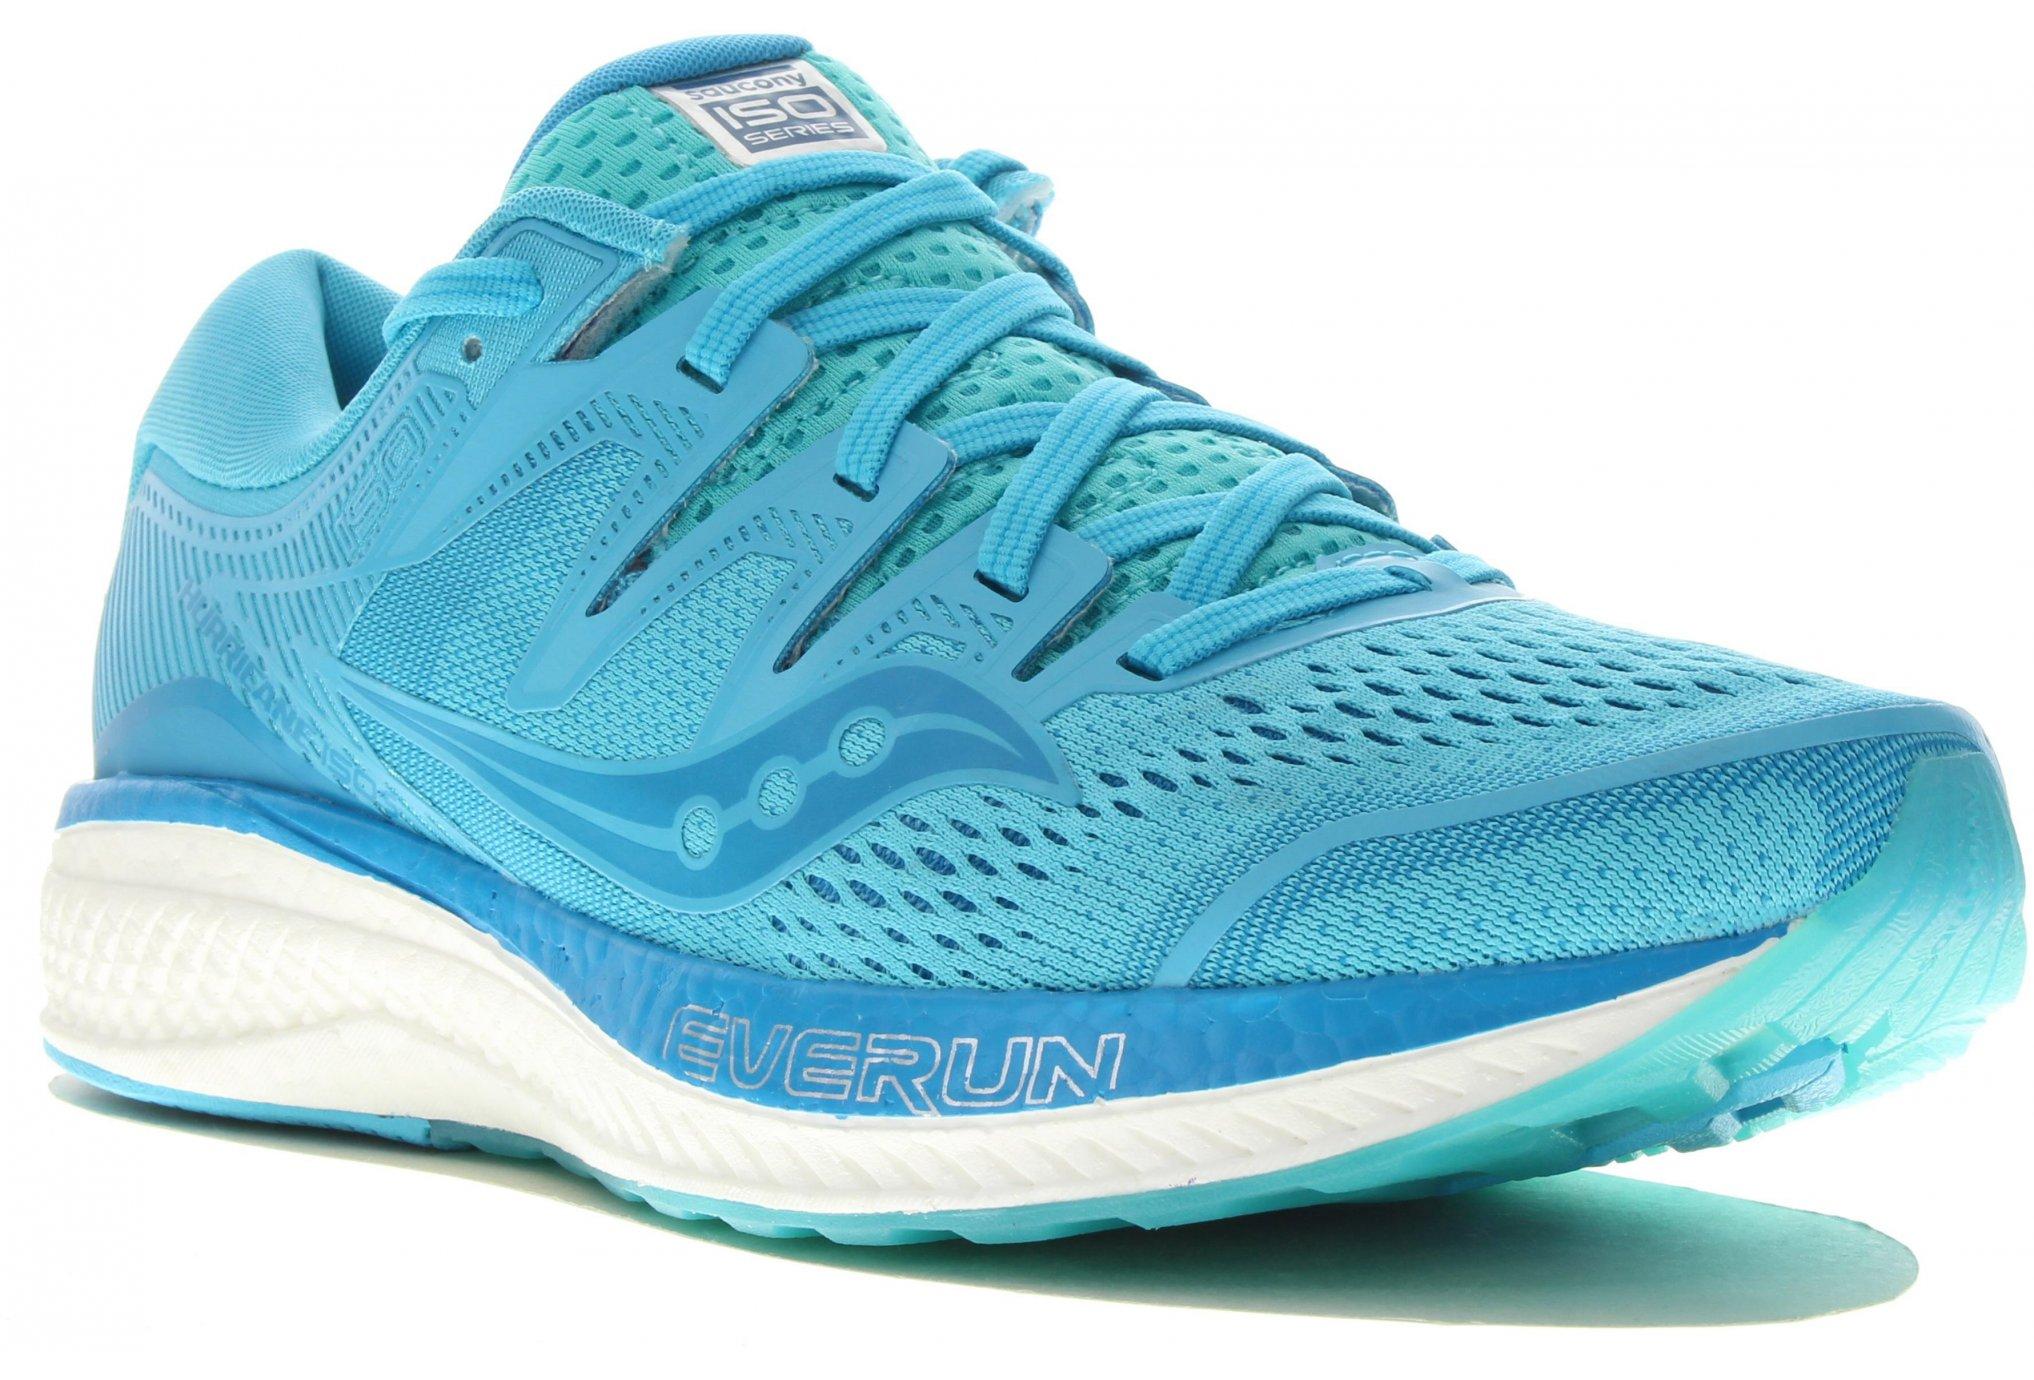 Saucony Hurricane ISO 5 Chaussures running femme